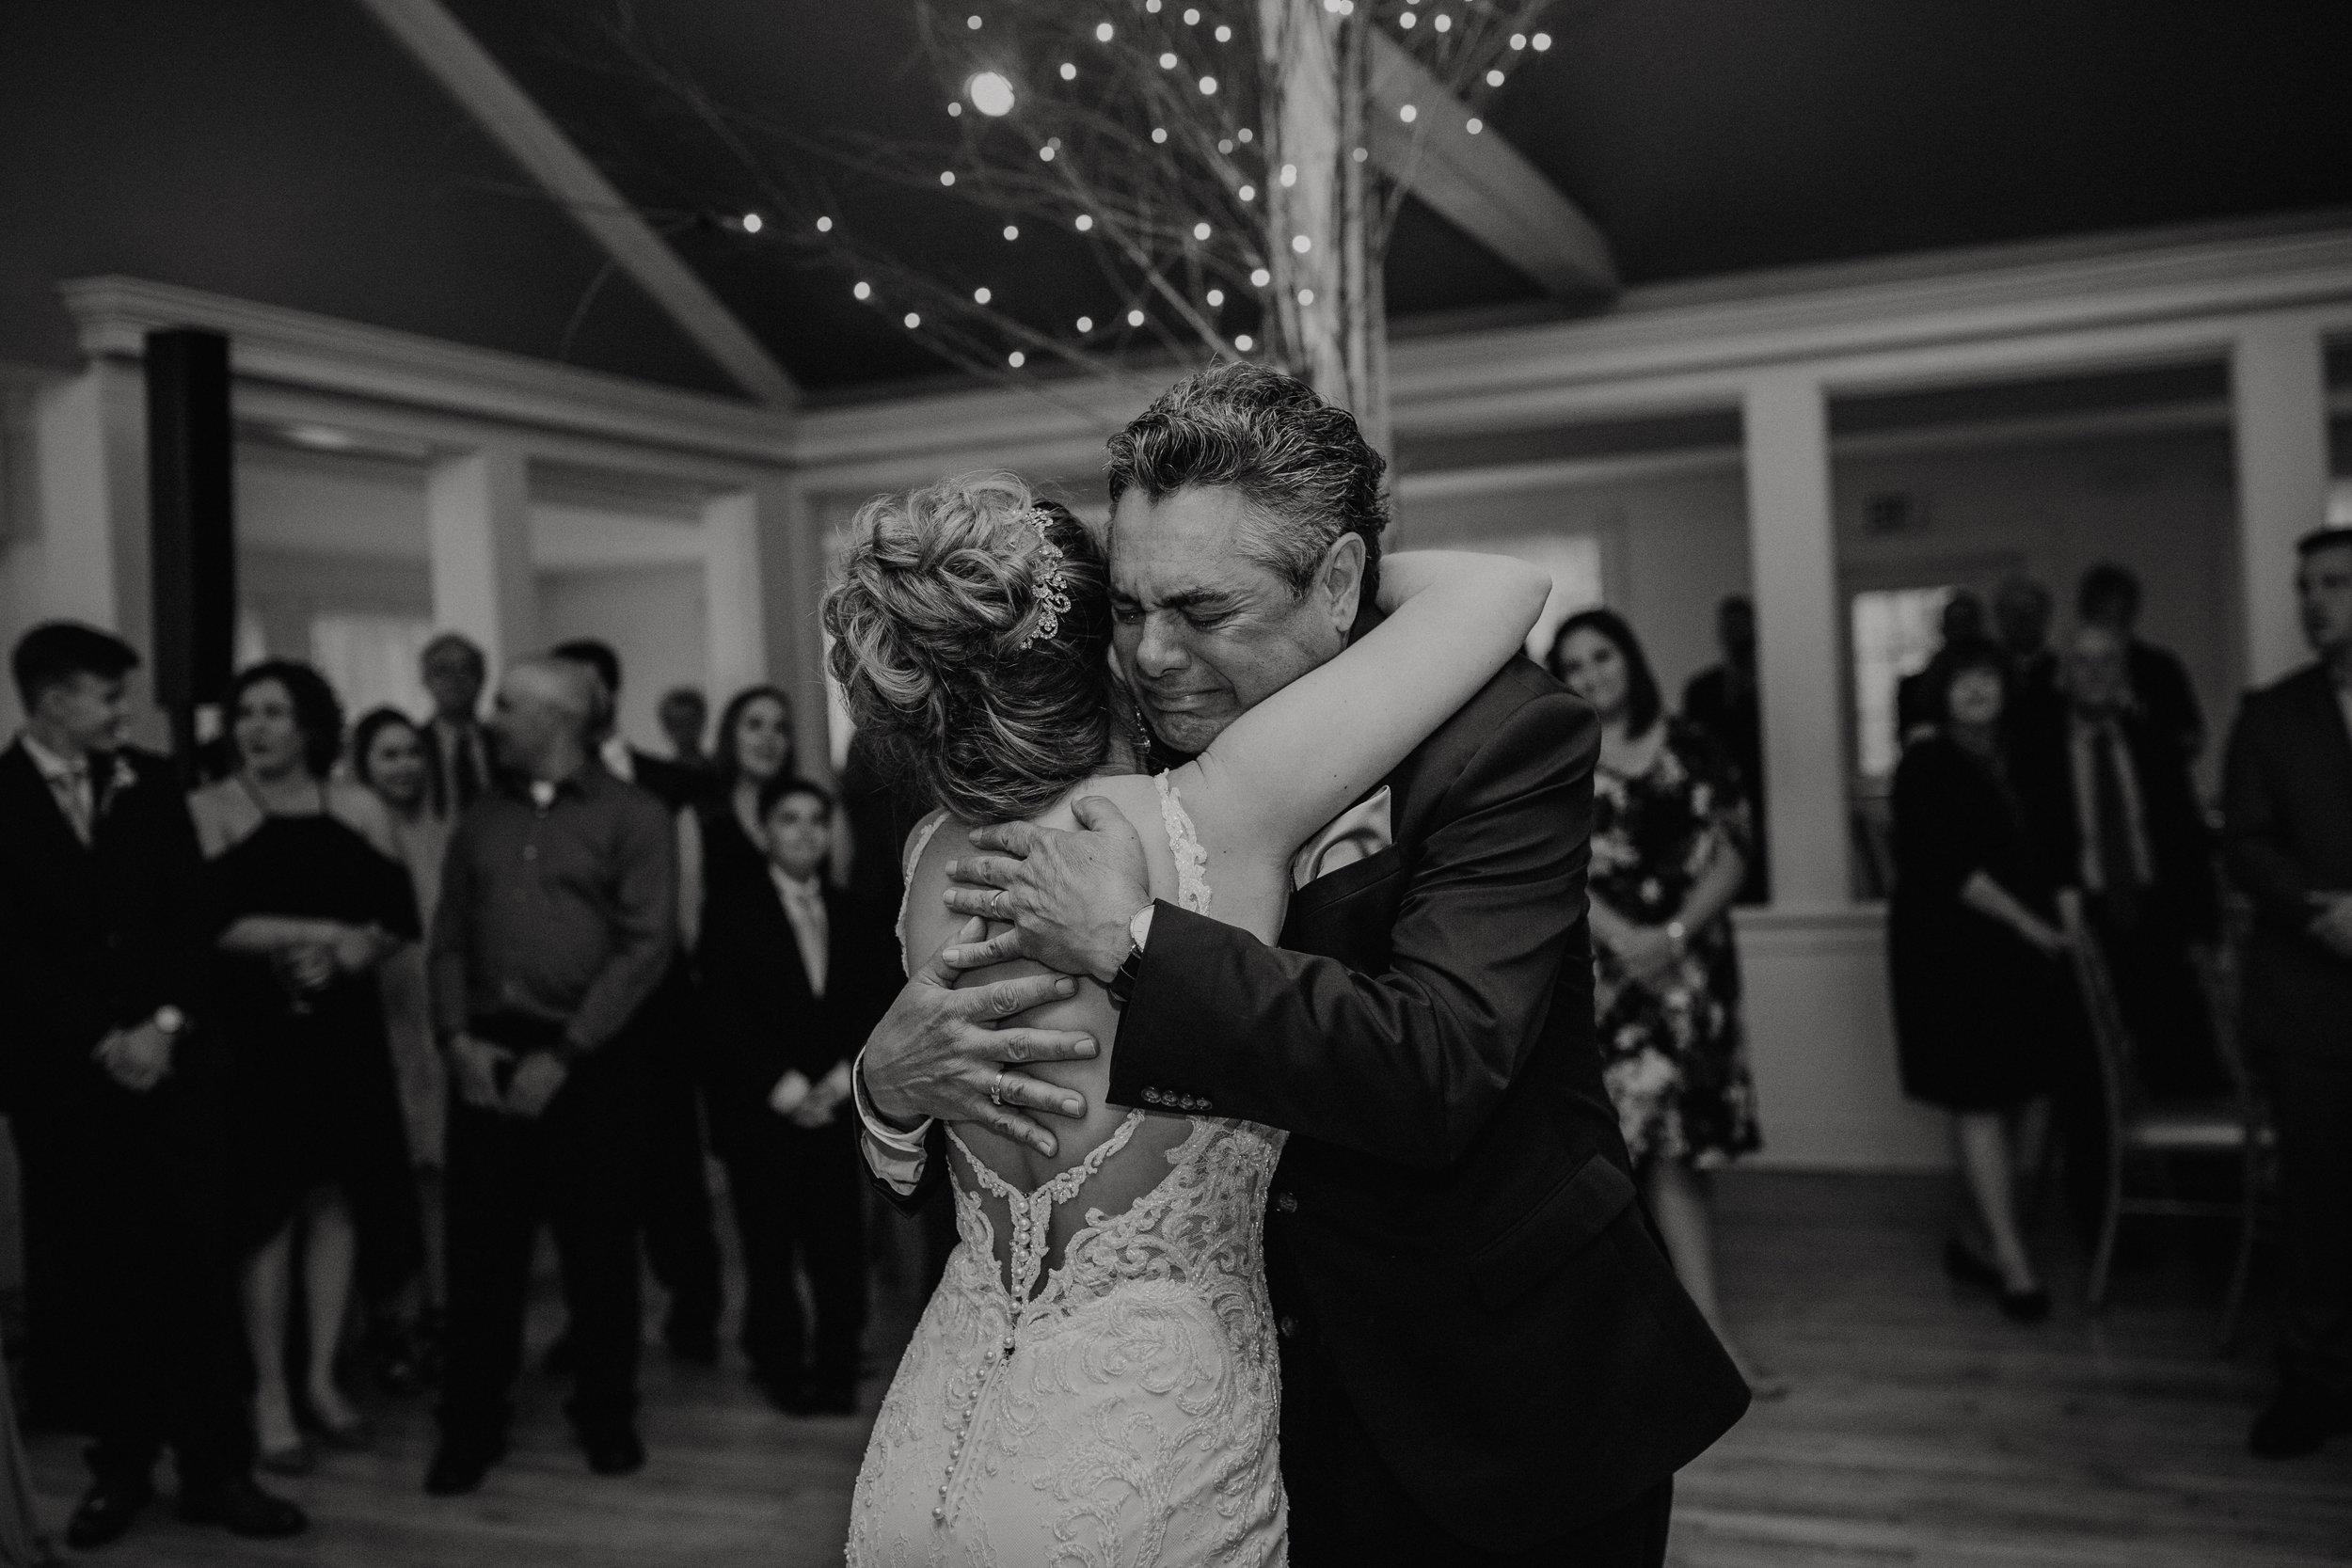 old_daley_on_crooked_lake_wedding_-84.jpg